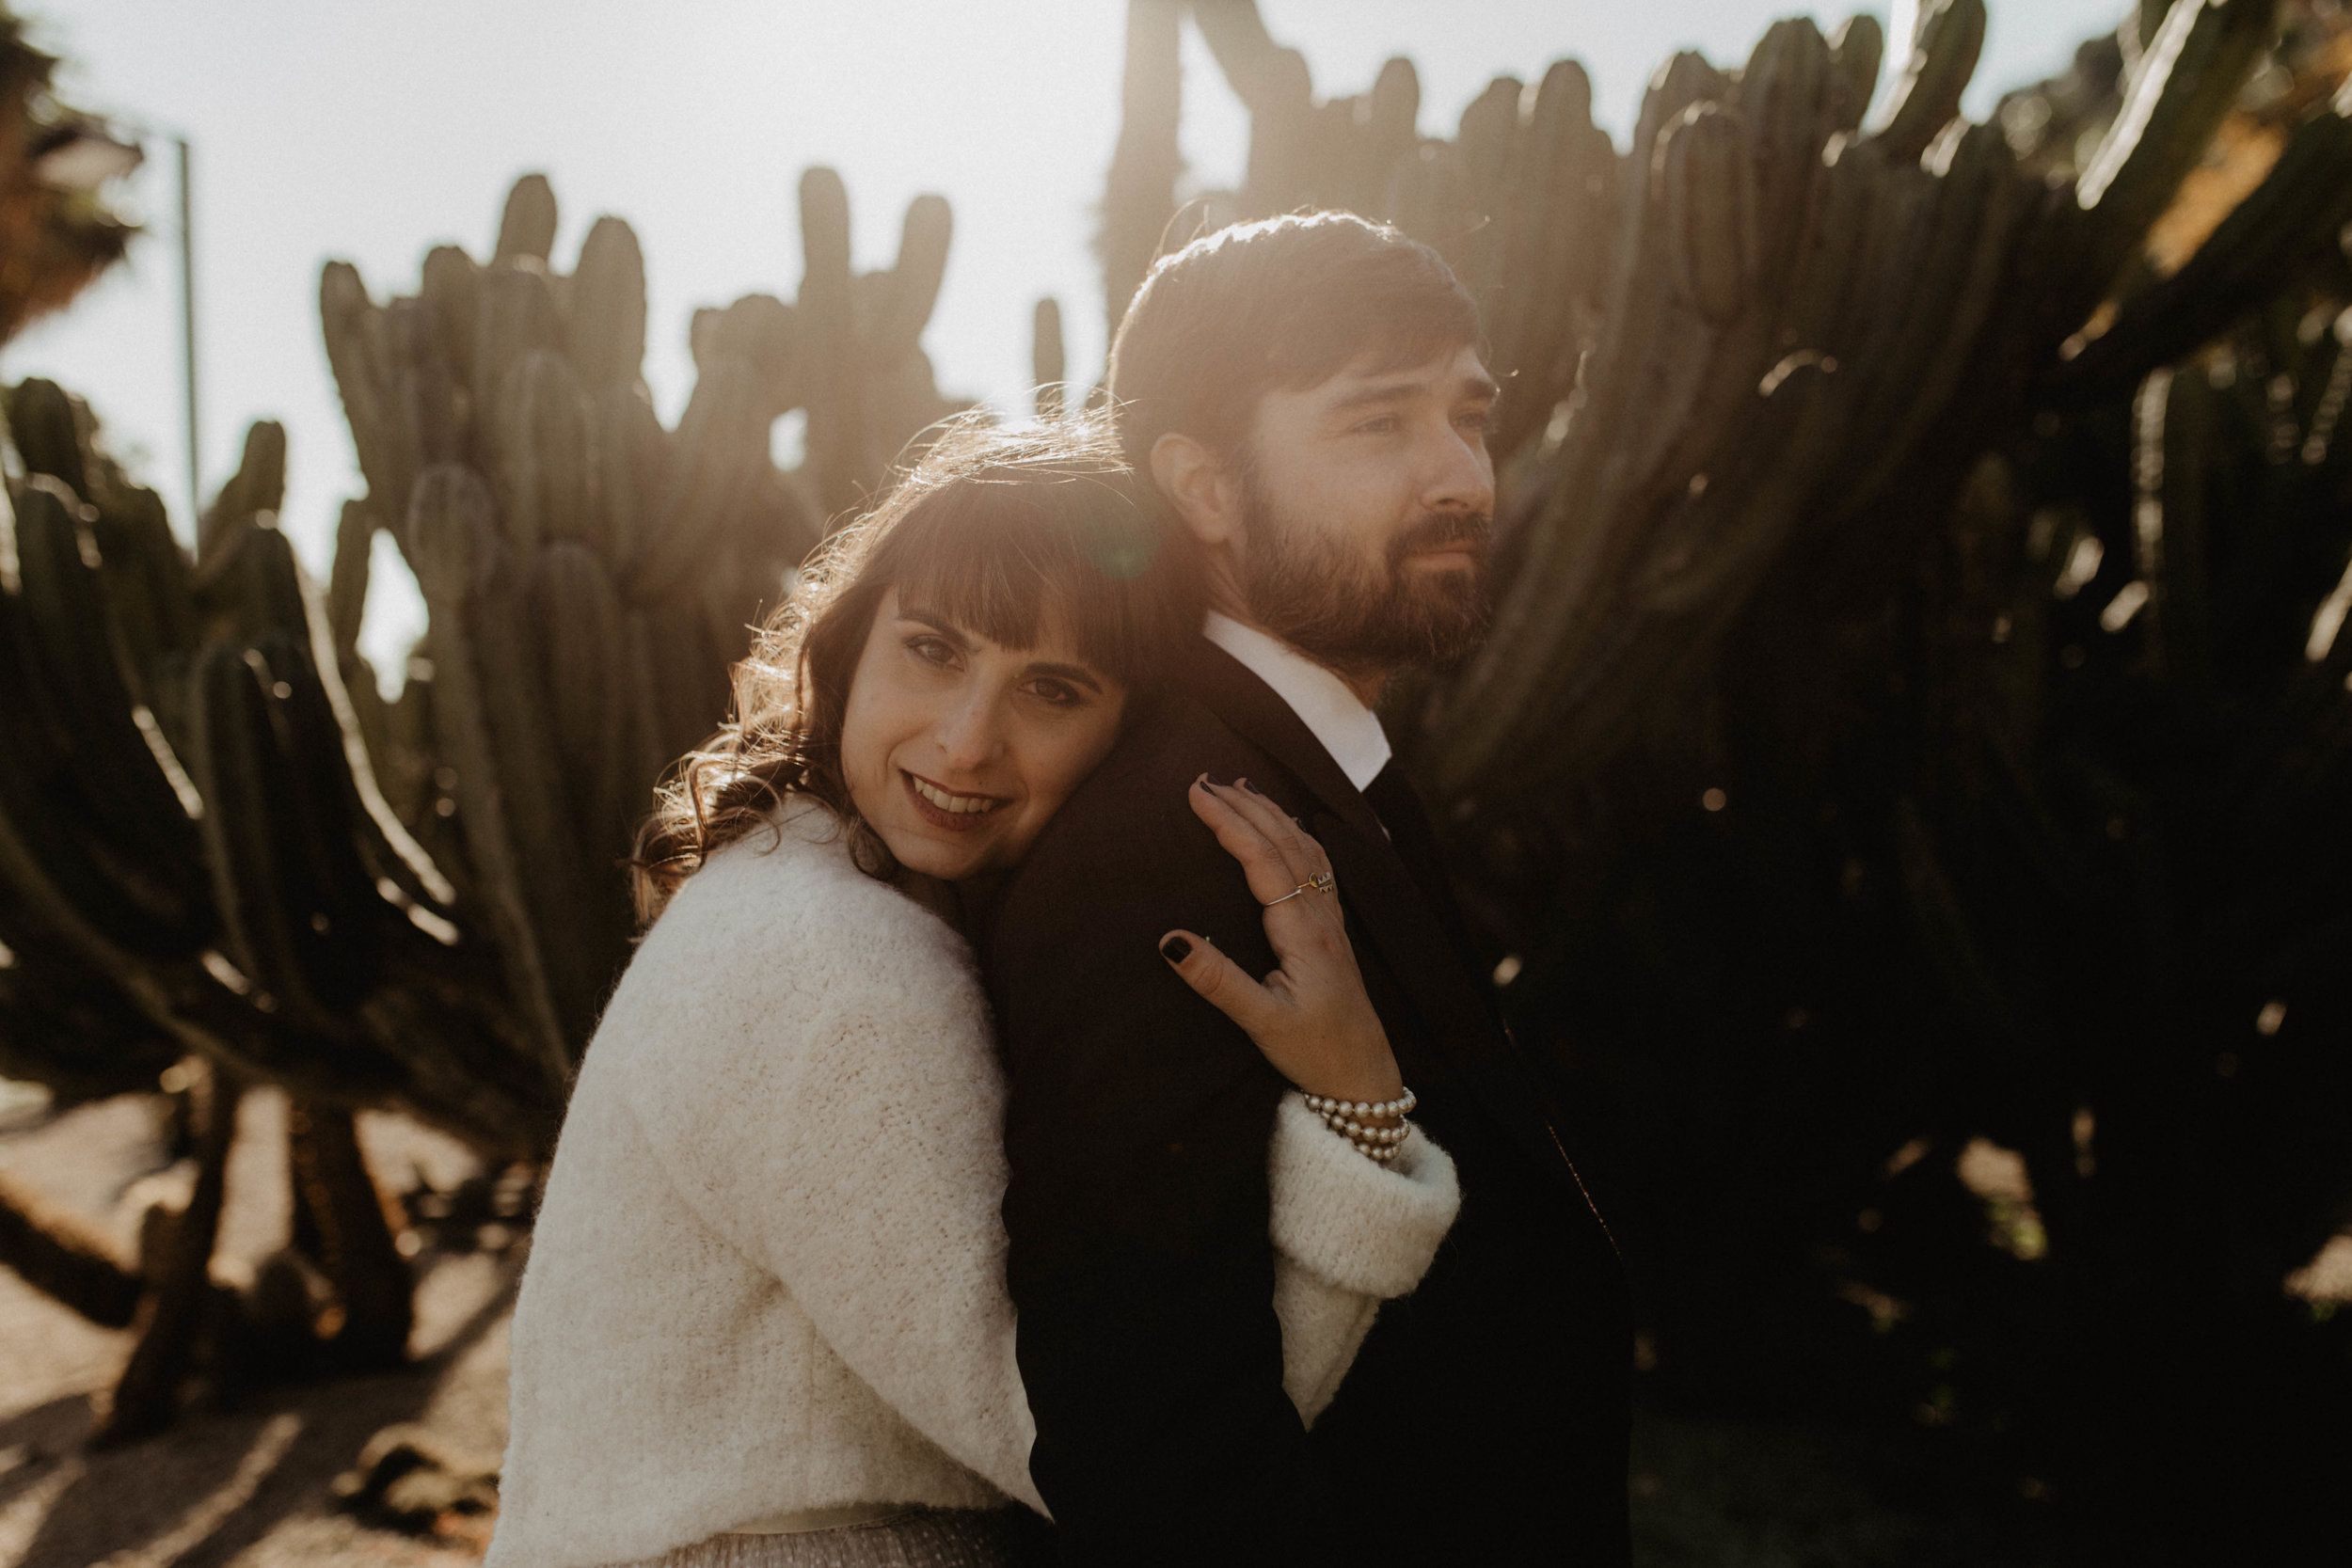 thenortherngirlphotography-photography-weddingphotography-couple-bodasconestilo-bodasenbarcelona-martadavid-286.jpg